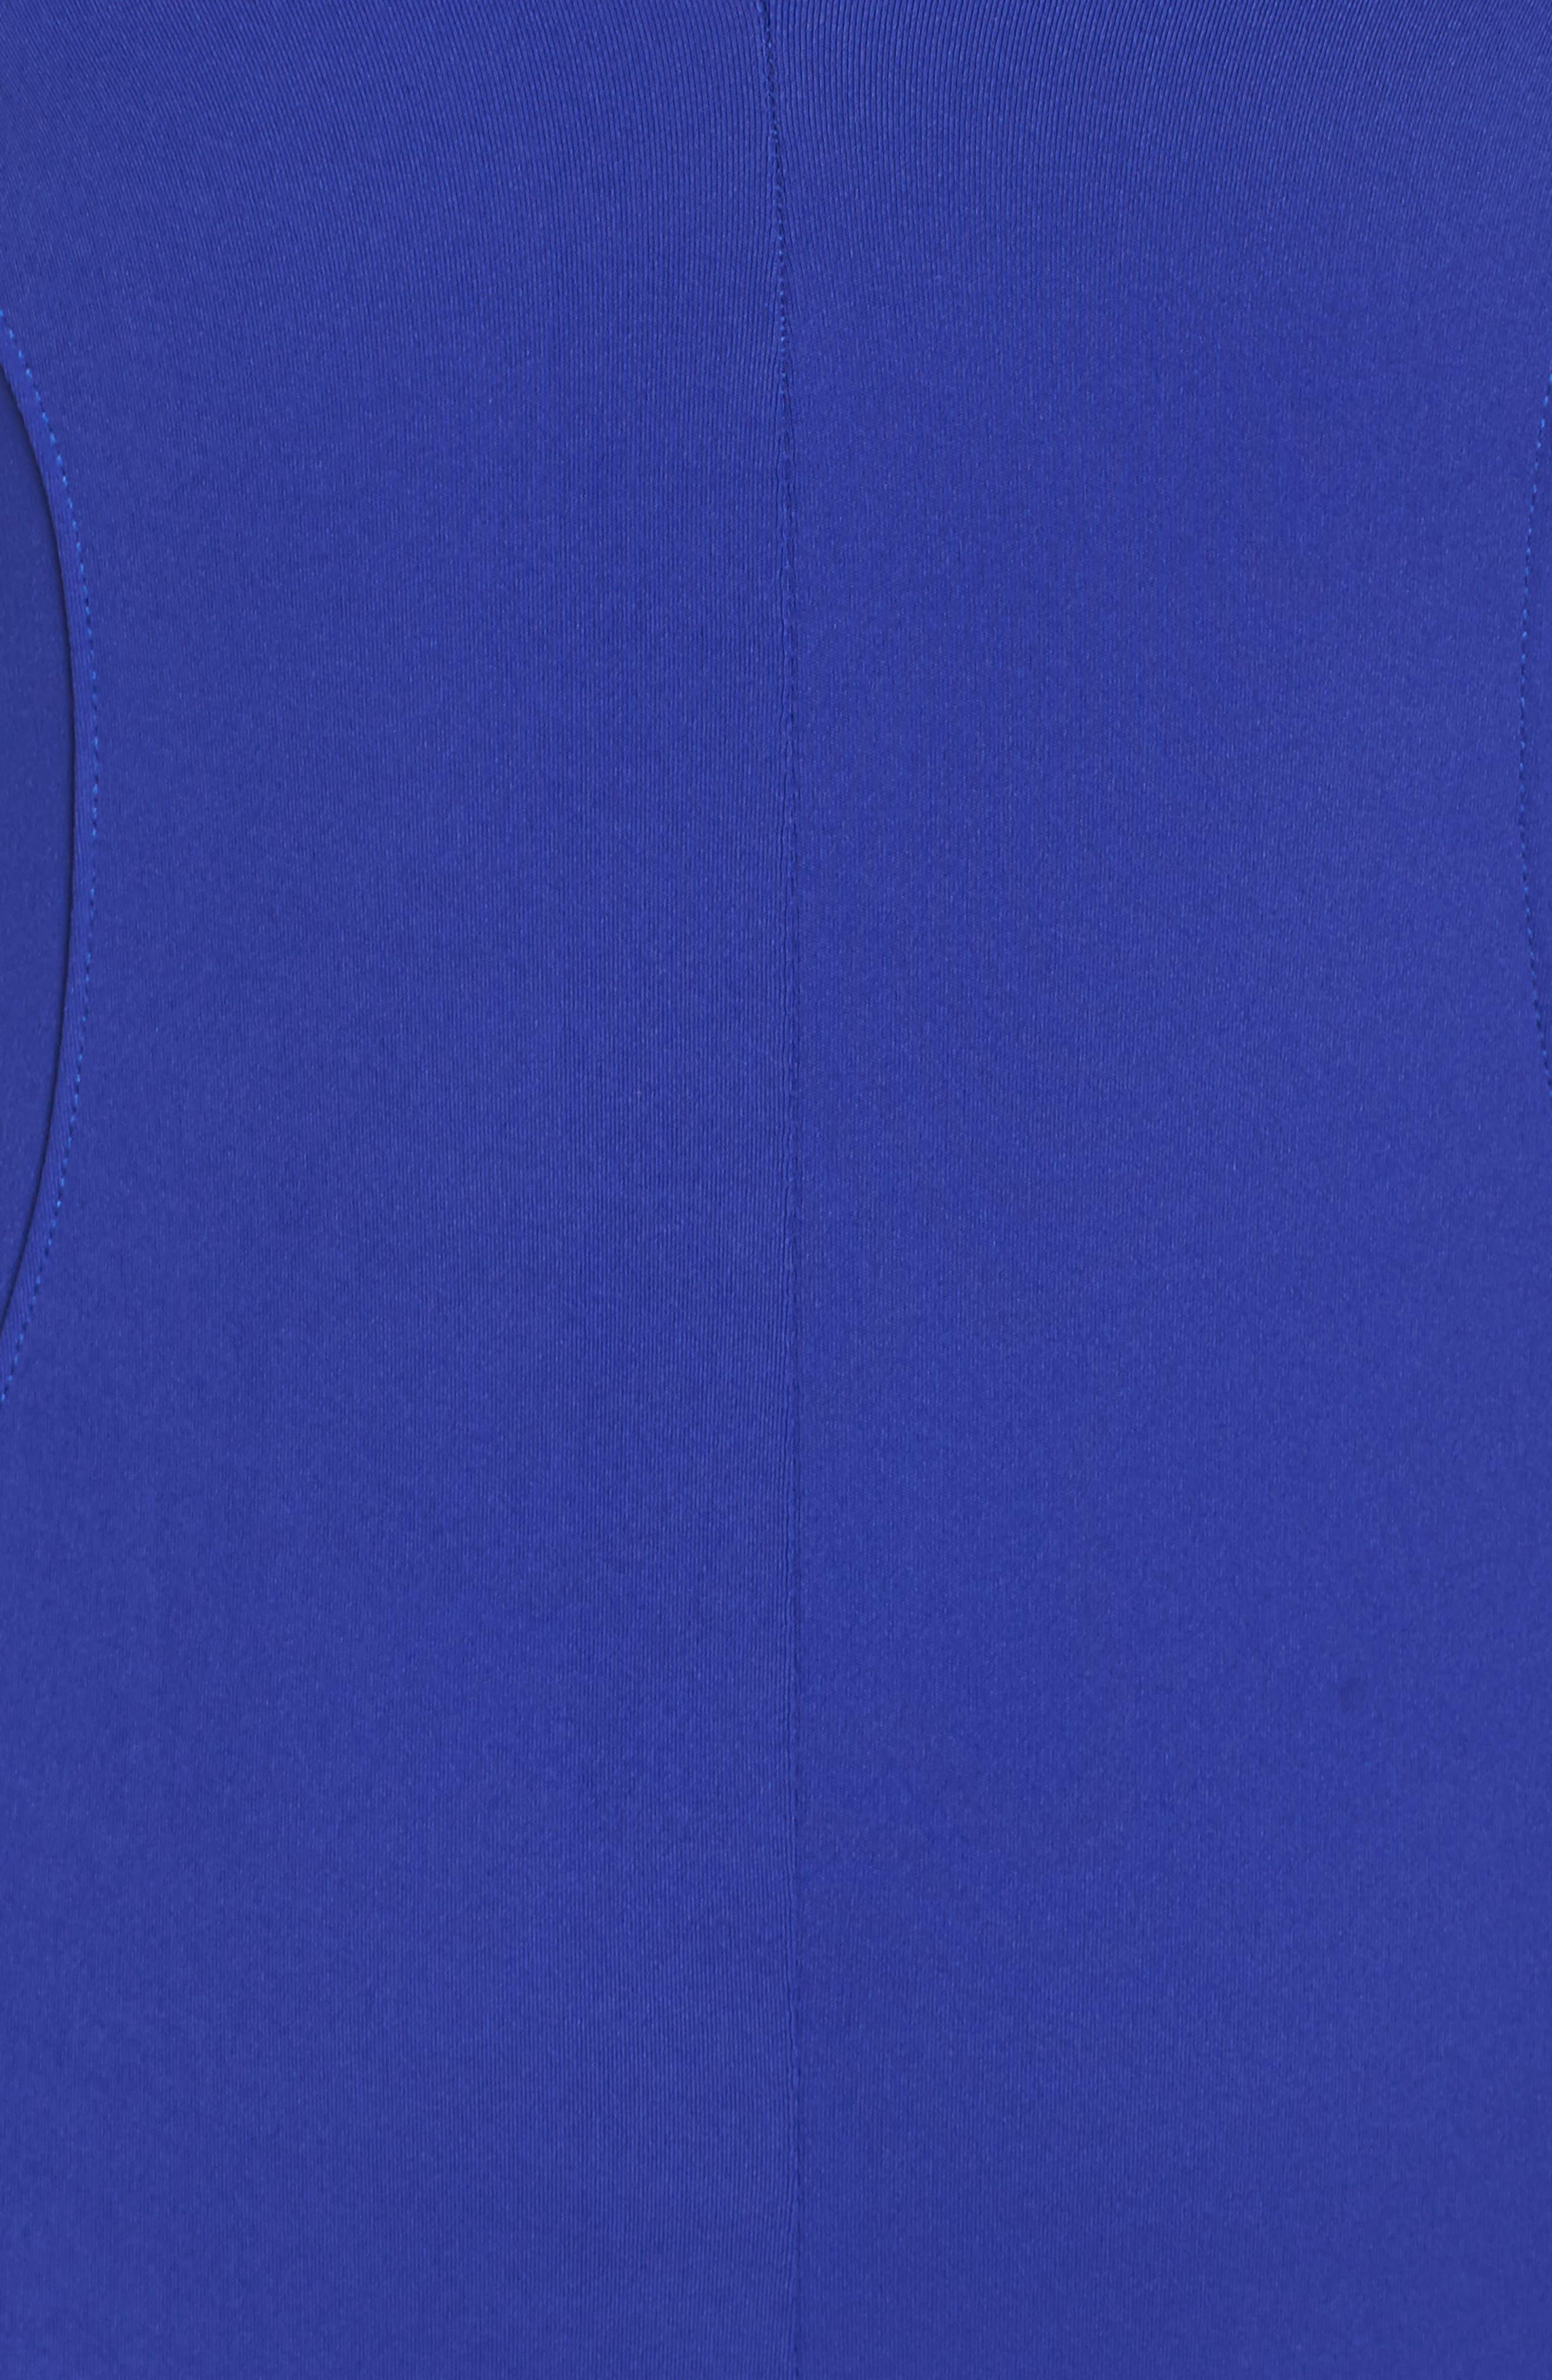 Intimately FP Thong Bodysuit,                             Alternate thumbnail 5, color,                             BLUE